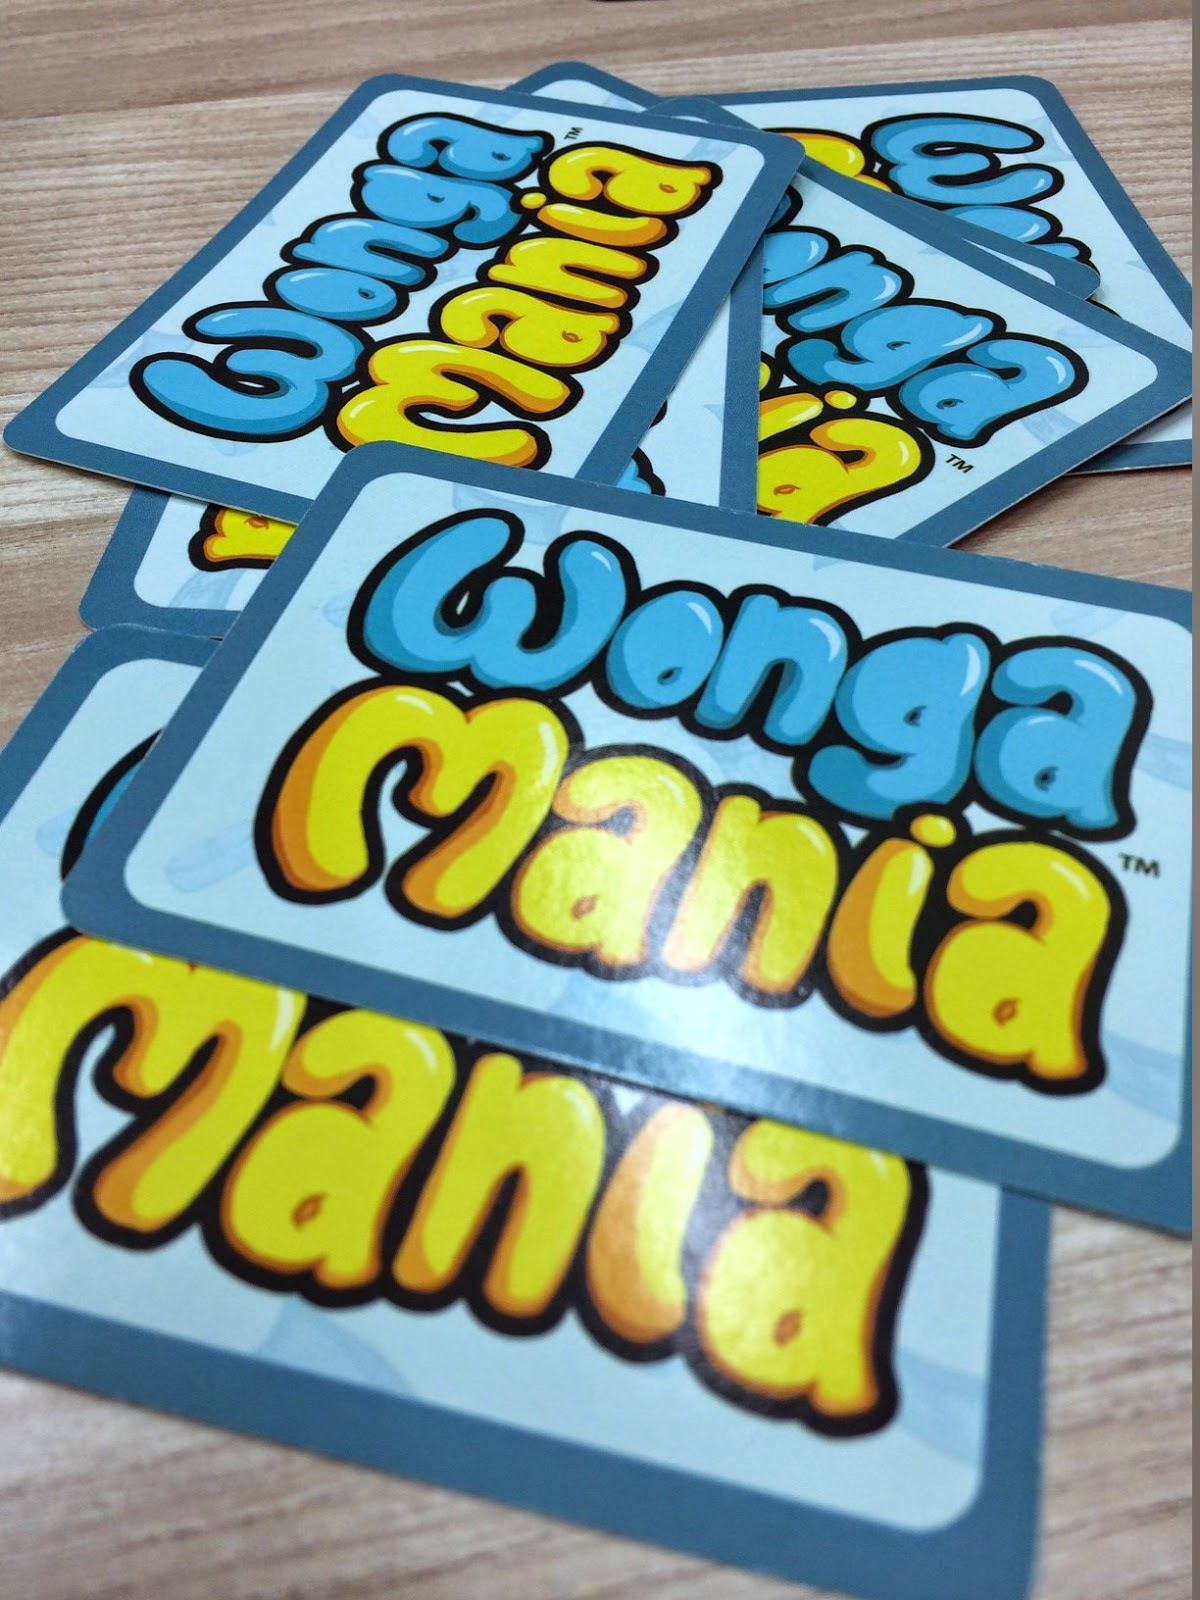 Wongamania card game